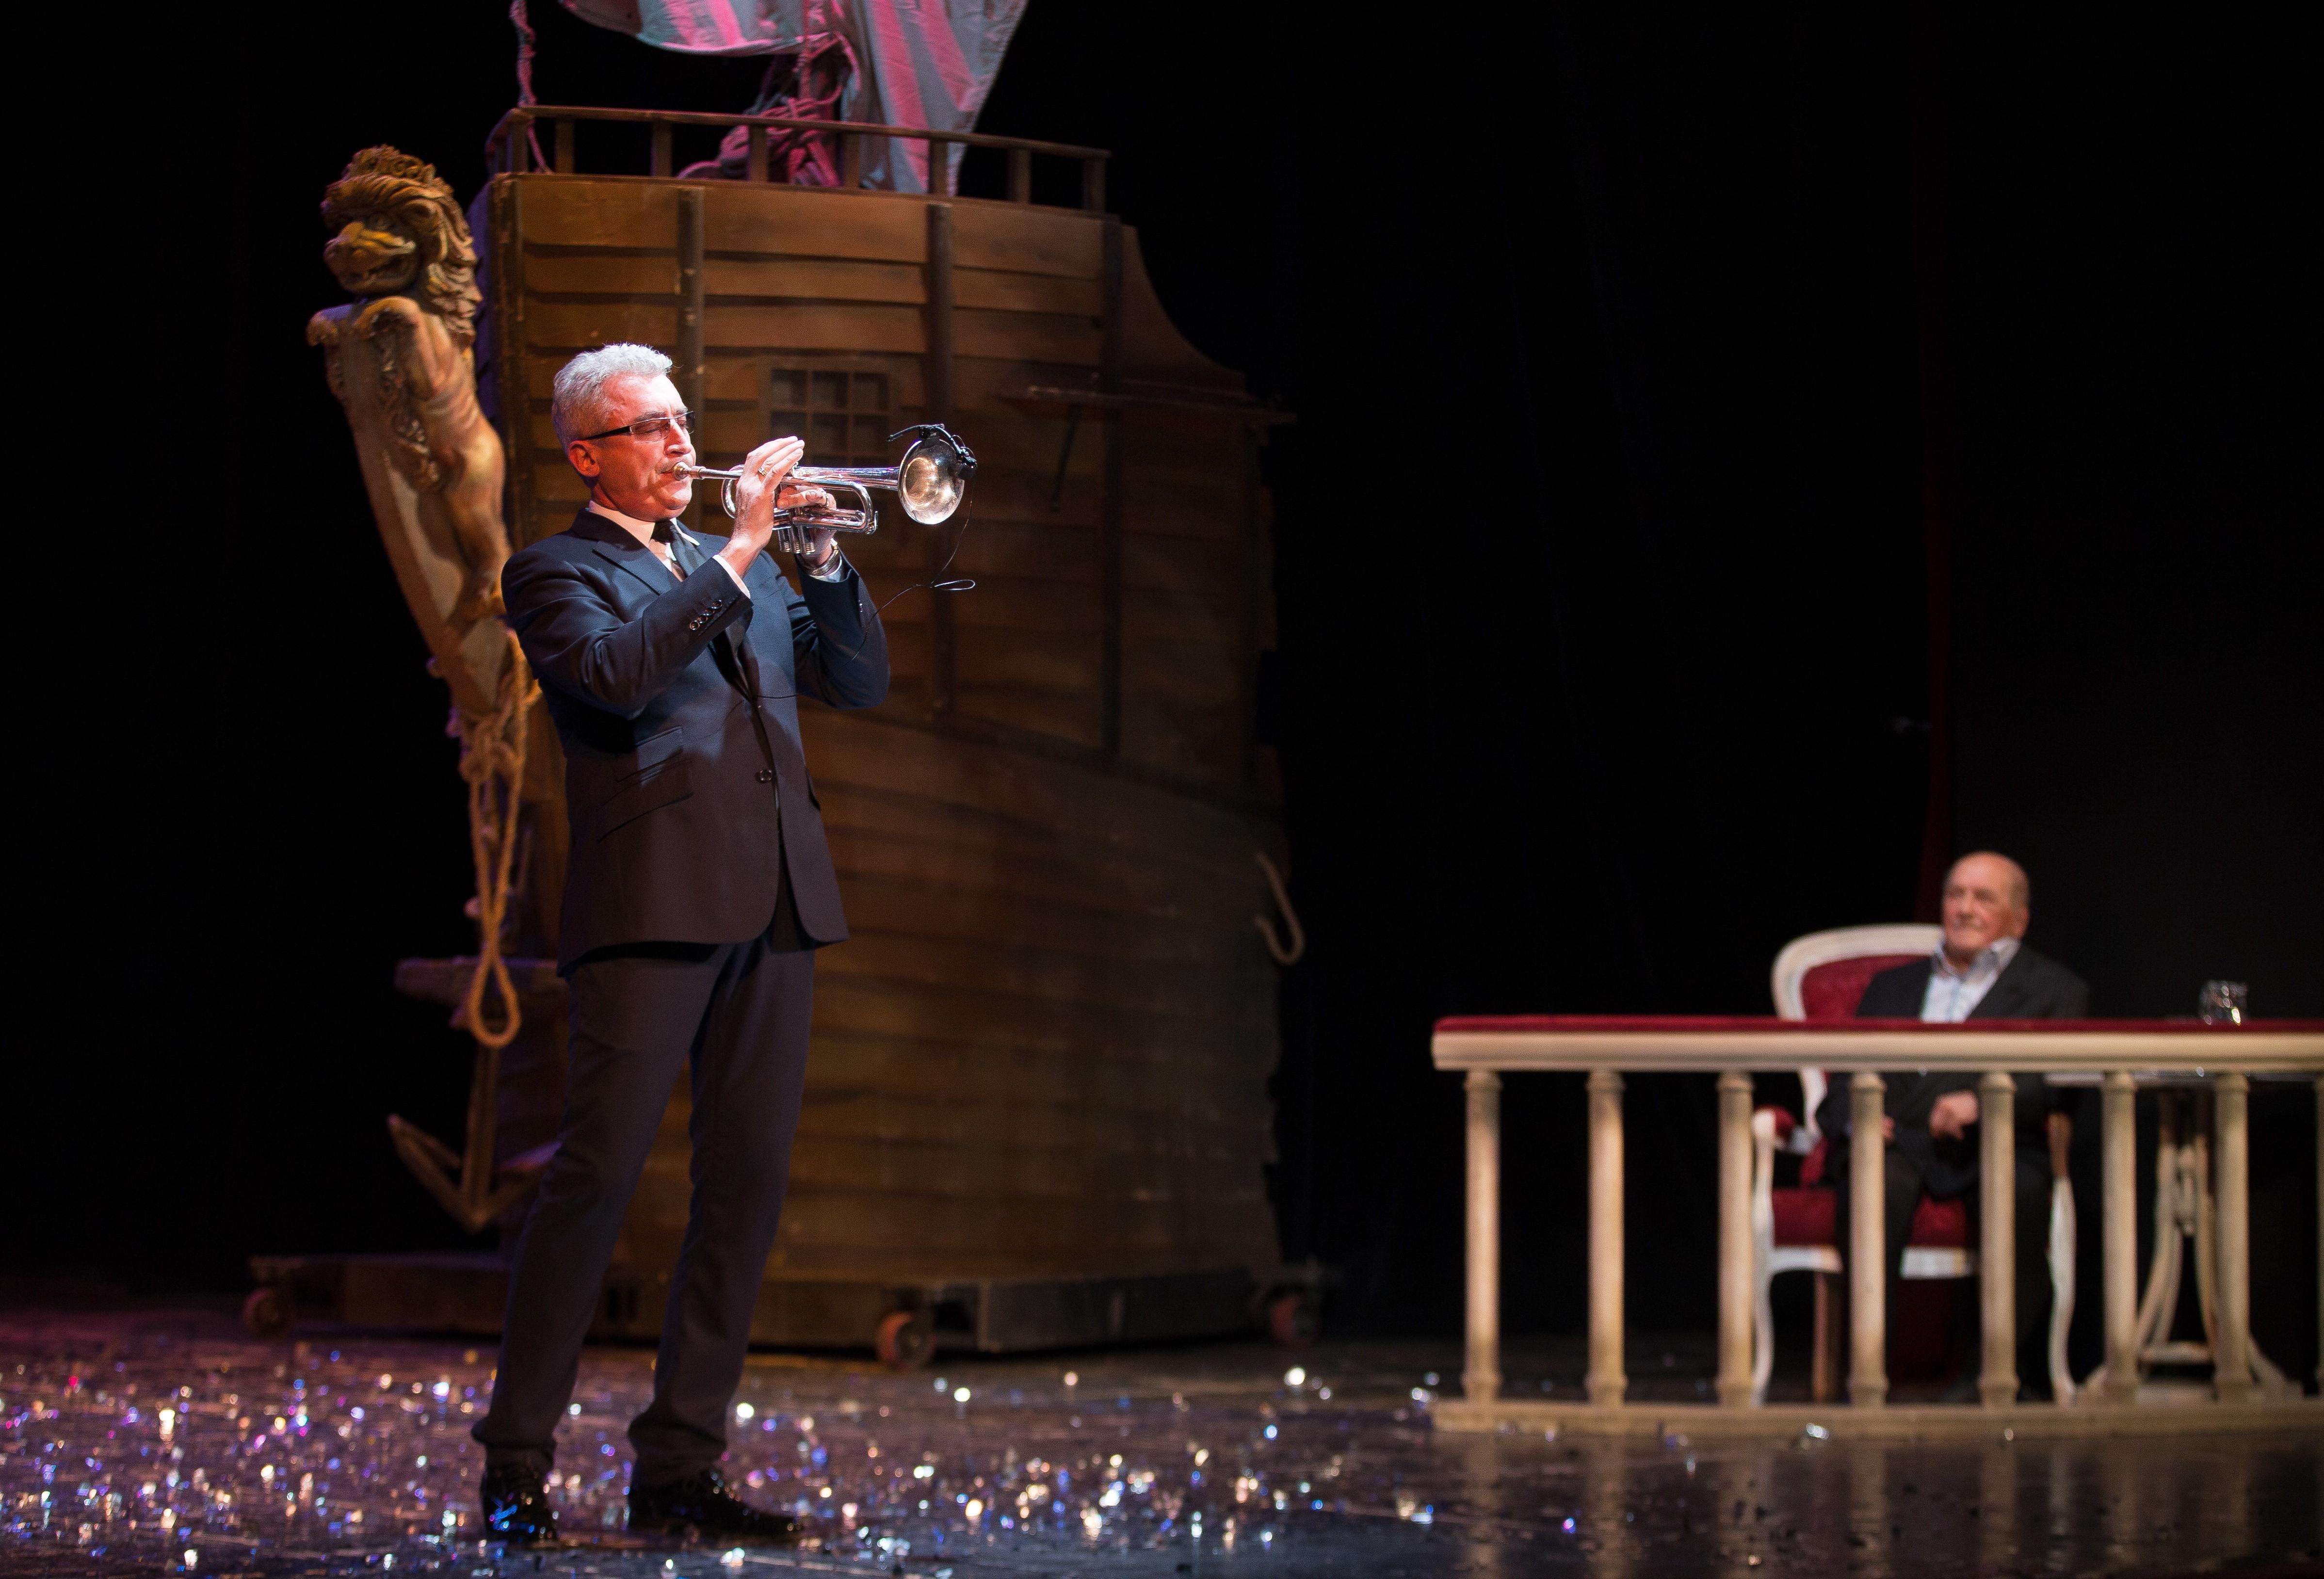 На59-м году жизни скончался русский трубач Семен Мильштейн